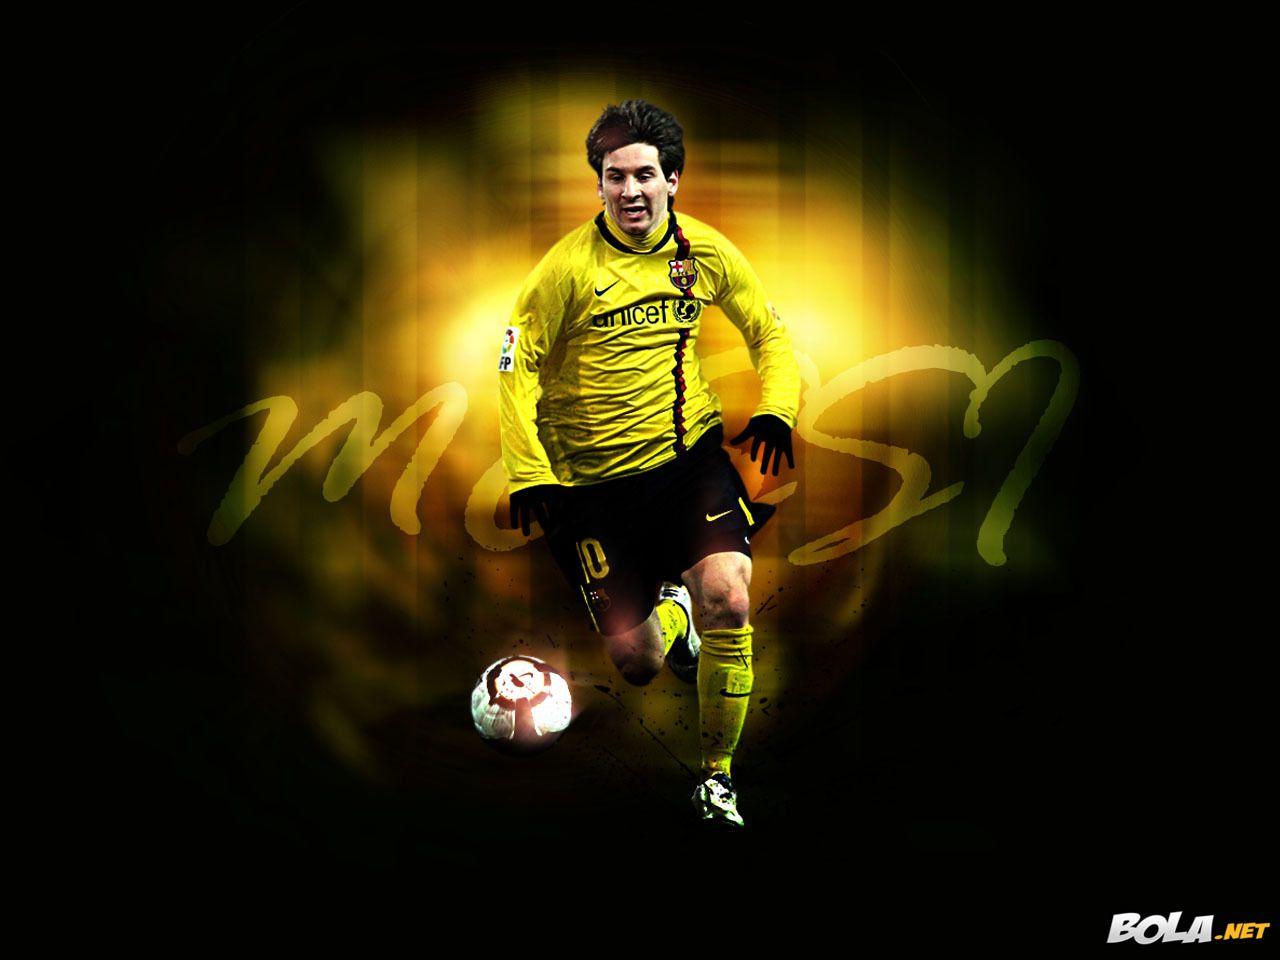 Lionel Messi Barcelona Wallpaper  HD desktop wallpaper